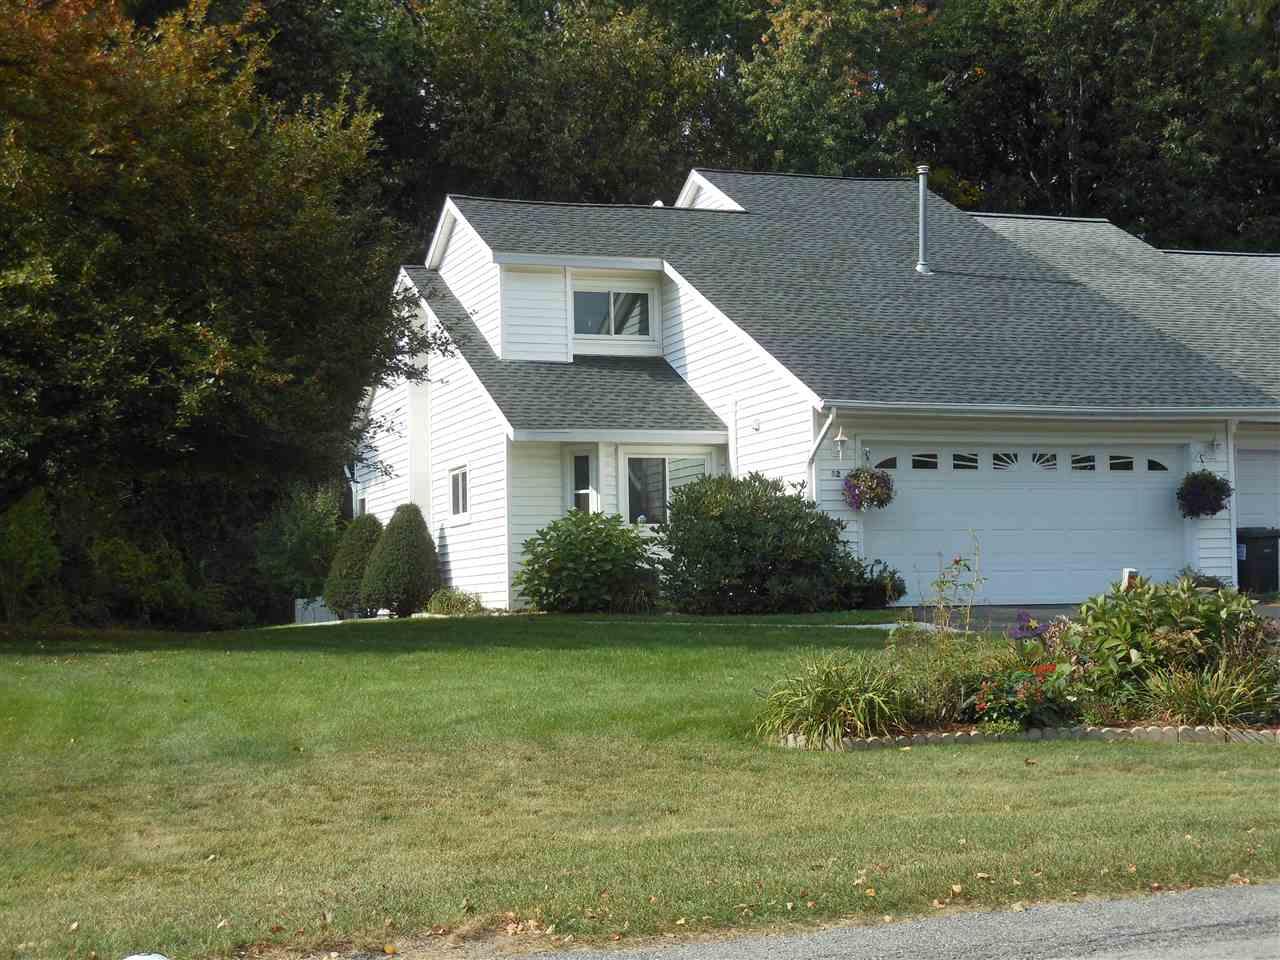 12 Green Meadow Dr, Clifton Park, NY 12065